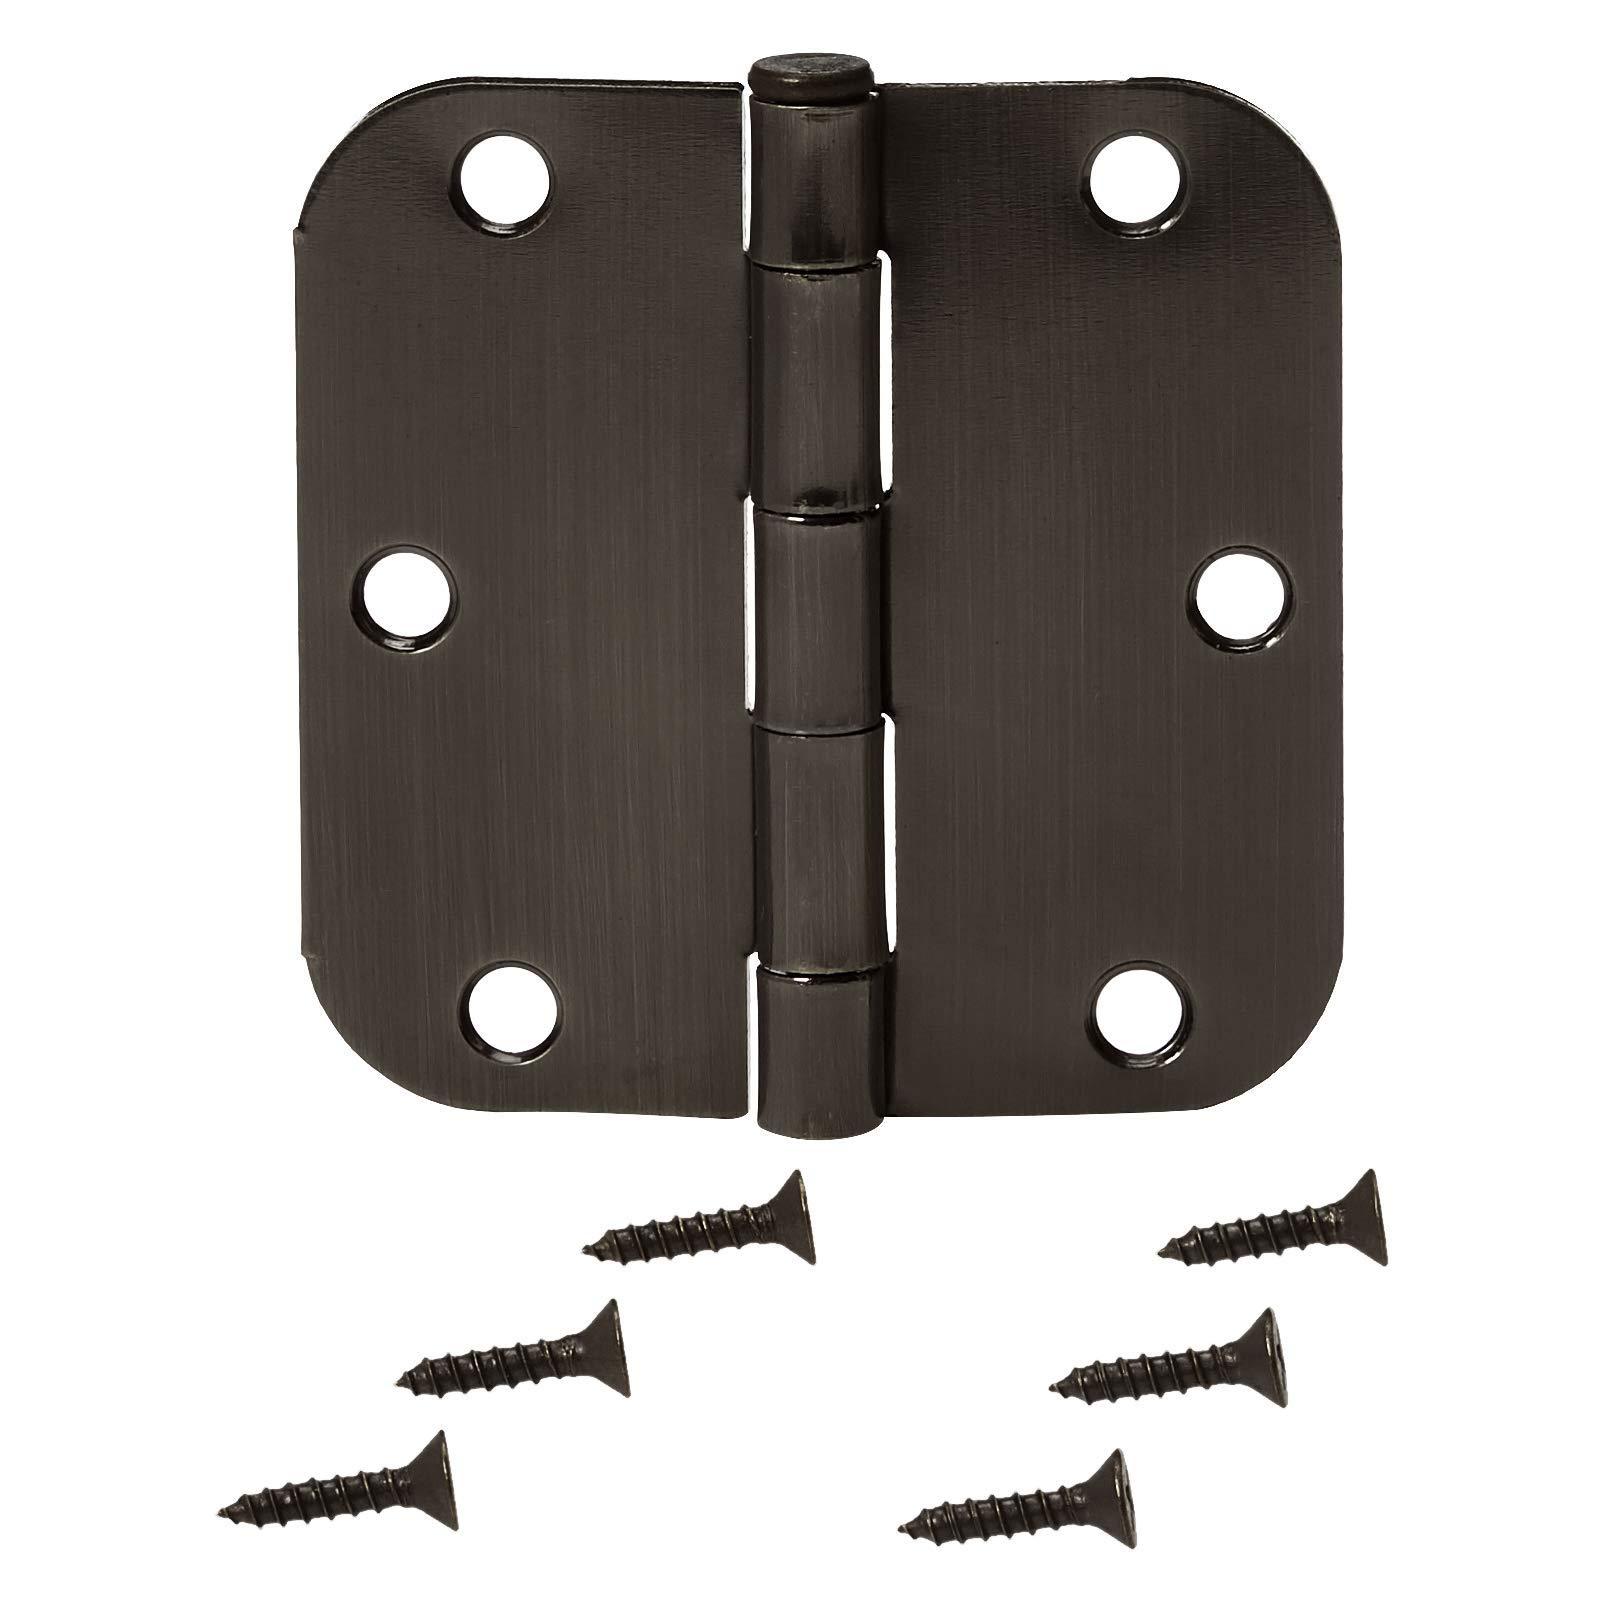 AmazonBasics Rounded 3.5'' x 3.5'' Door Hinges - 18 Pack - Oil Rubbed Bronze by AmazonBasics (Image #3)